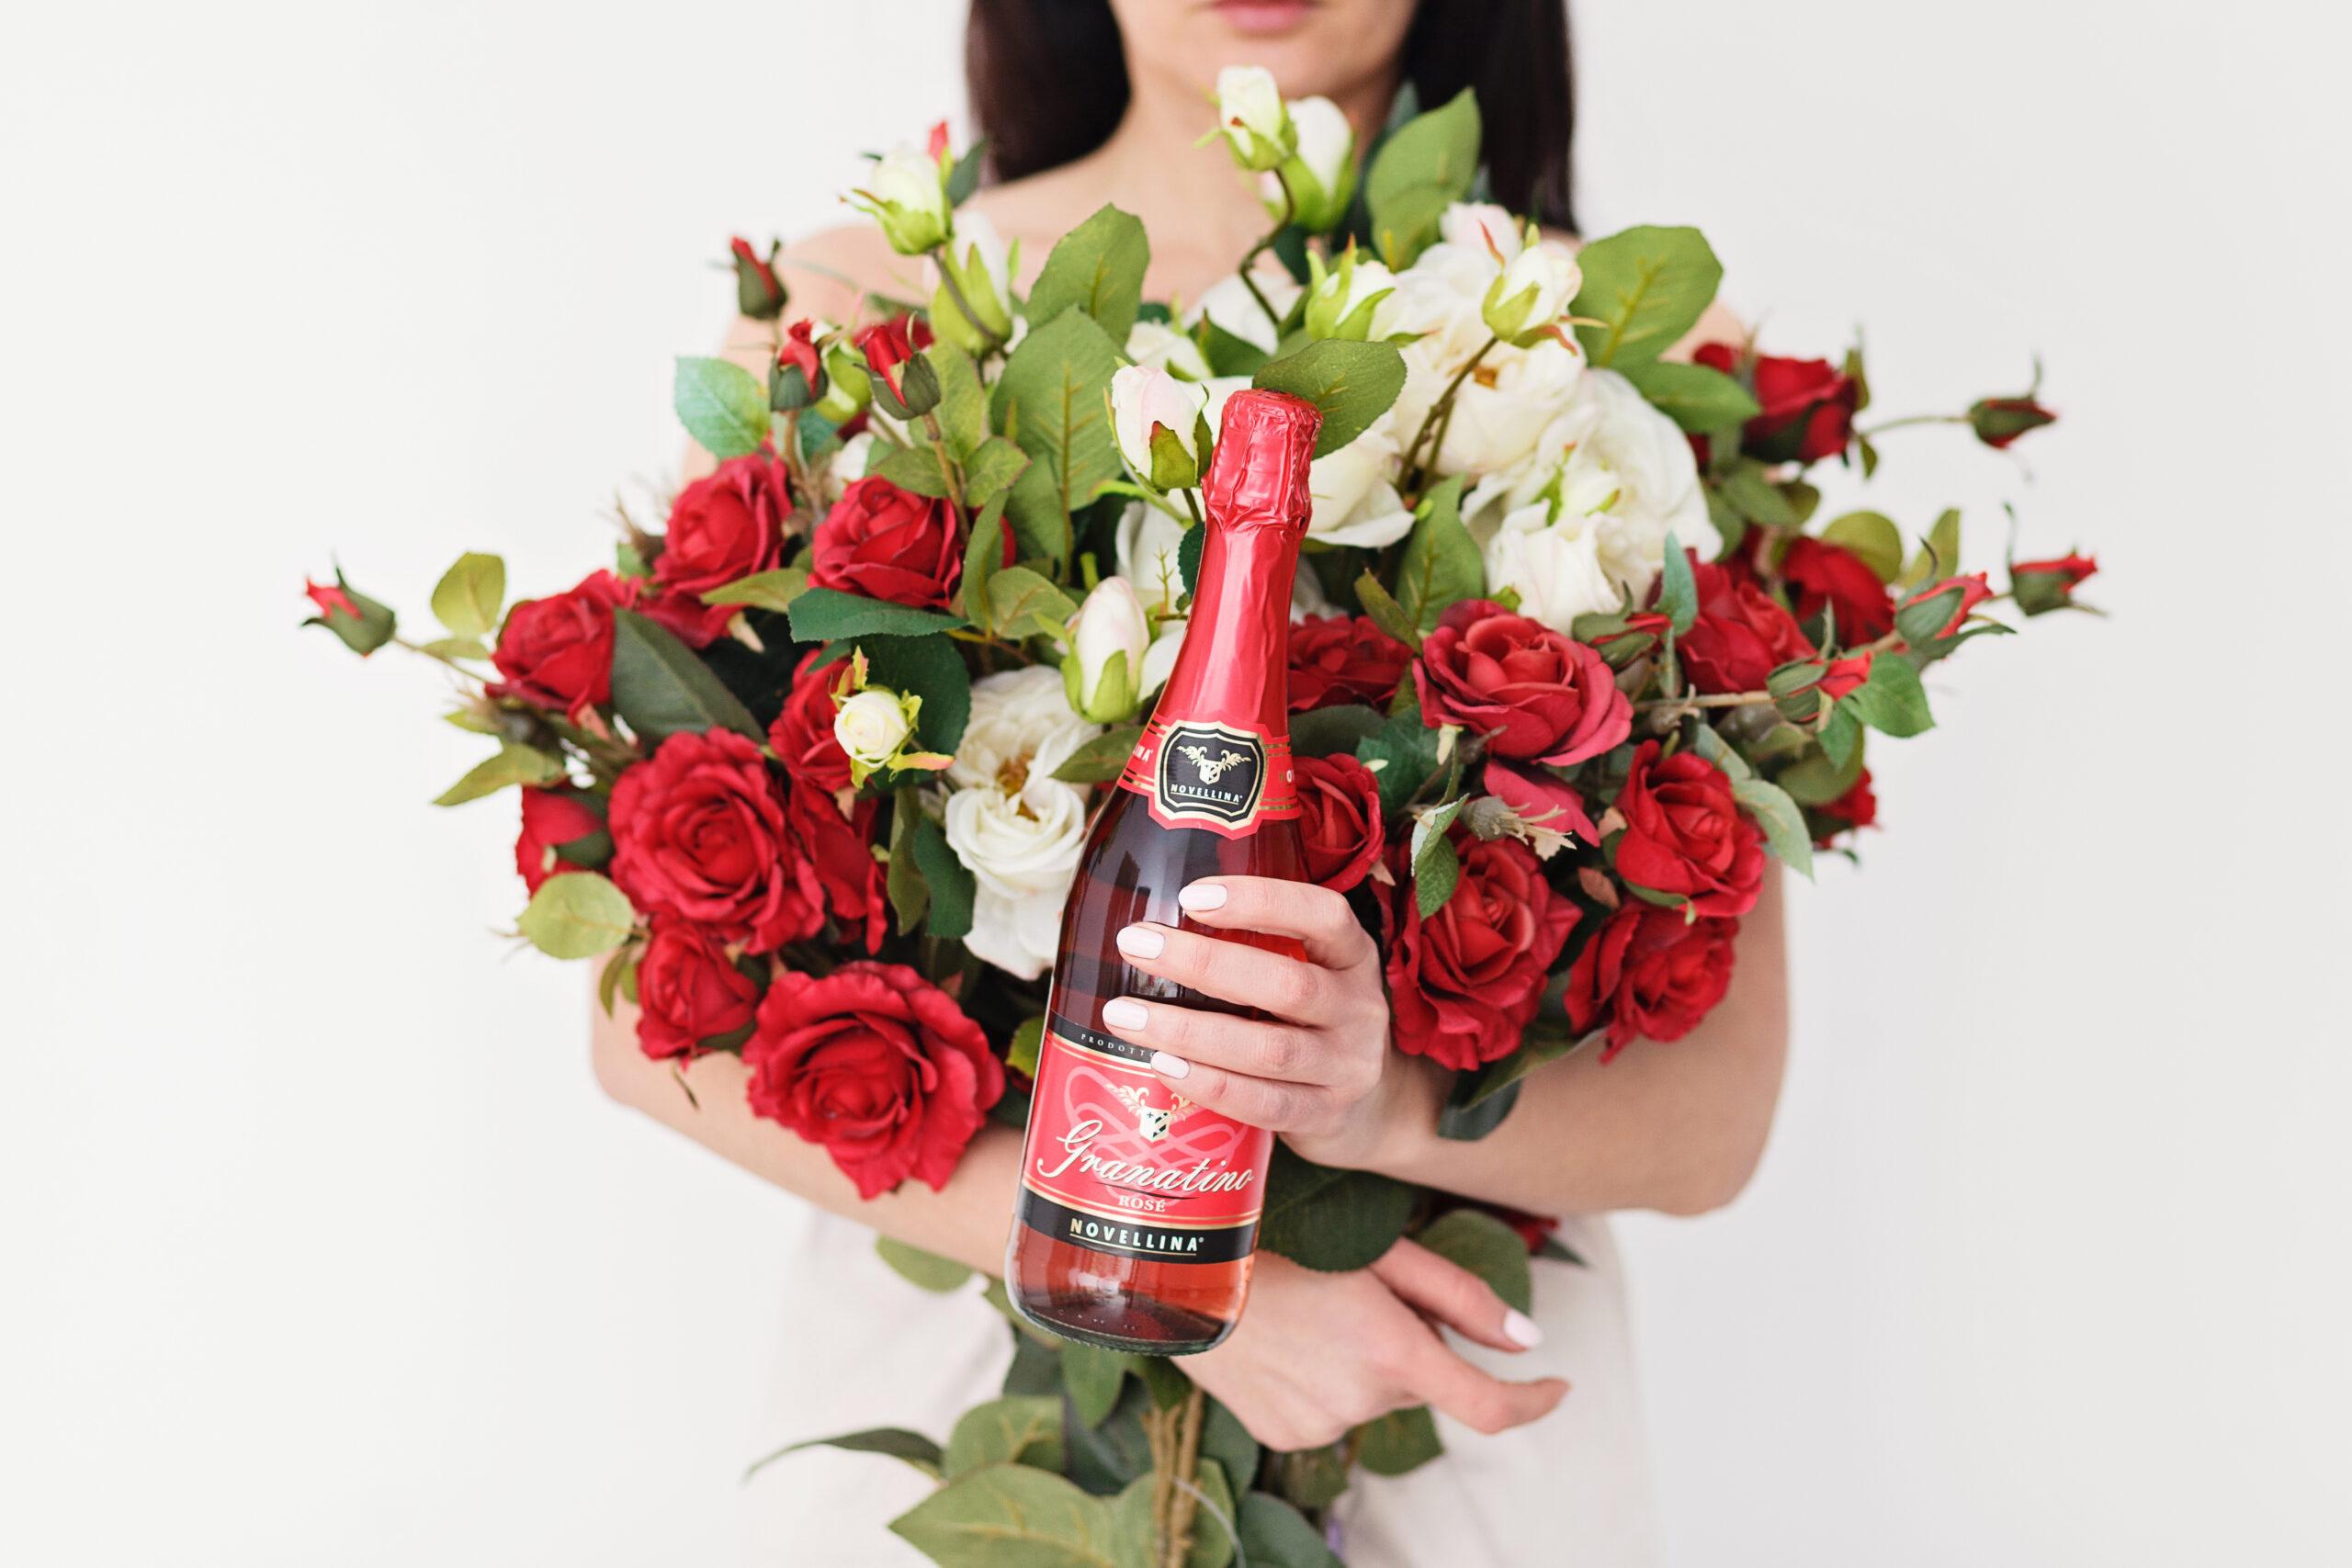 Fragolino Granatino Rose Novellina